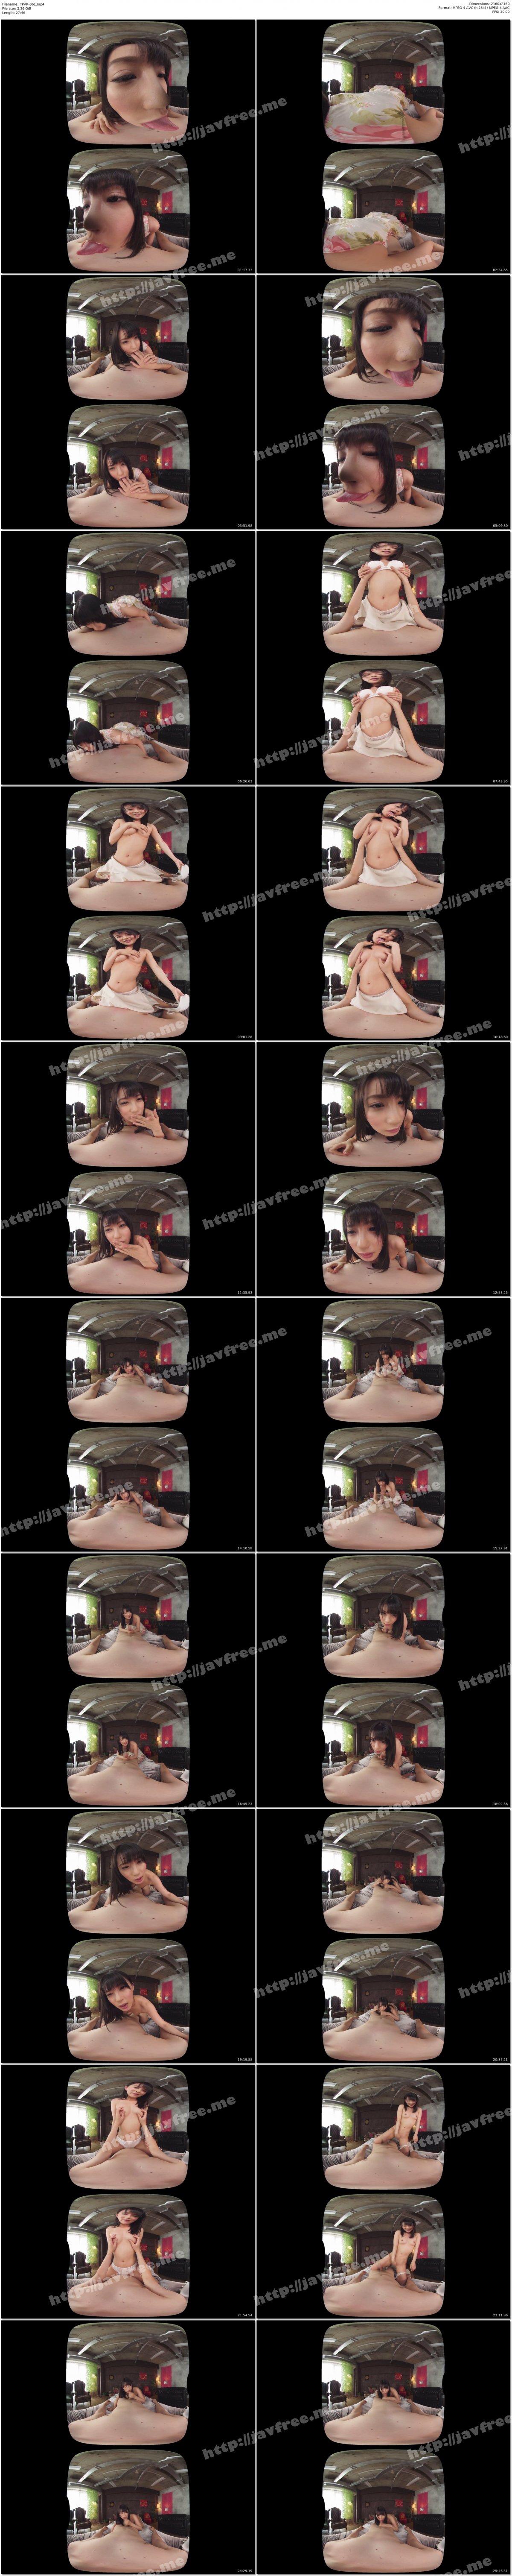 [HD][VEC-360] 部長の奥さんがエロすぎて… 八木あずさ - image TPVR-061 on https://javfree.me